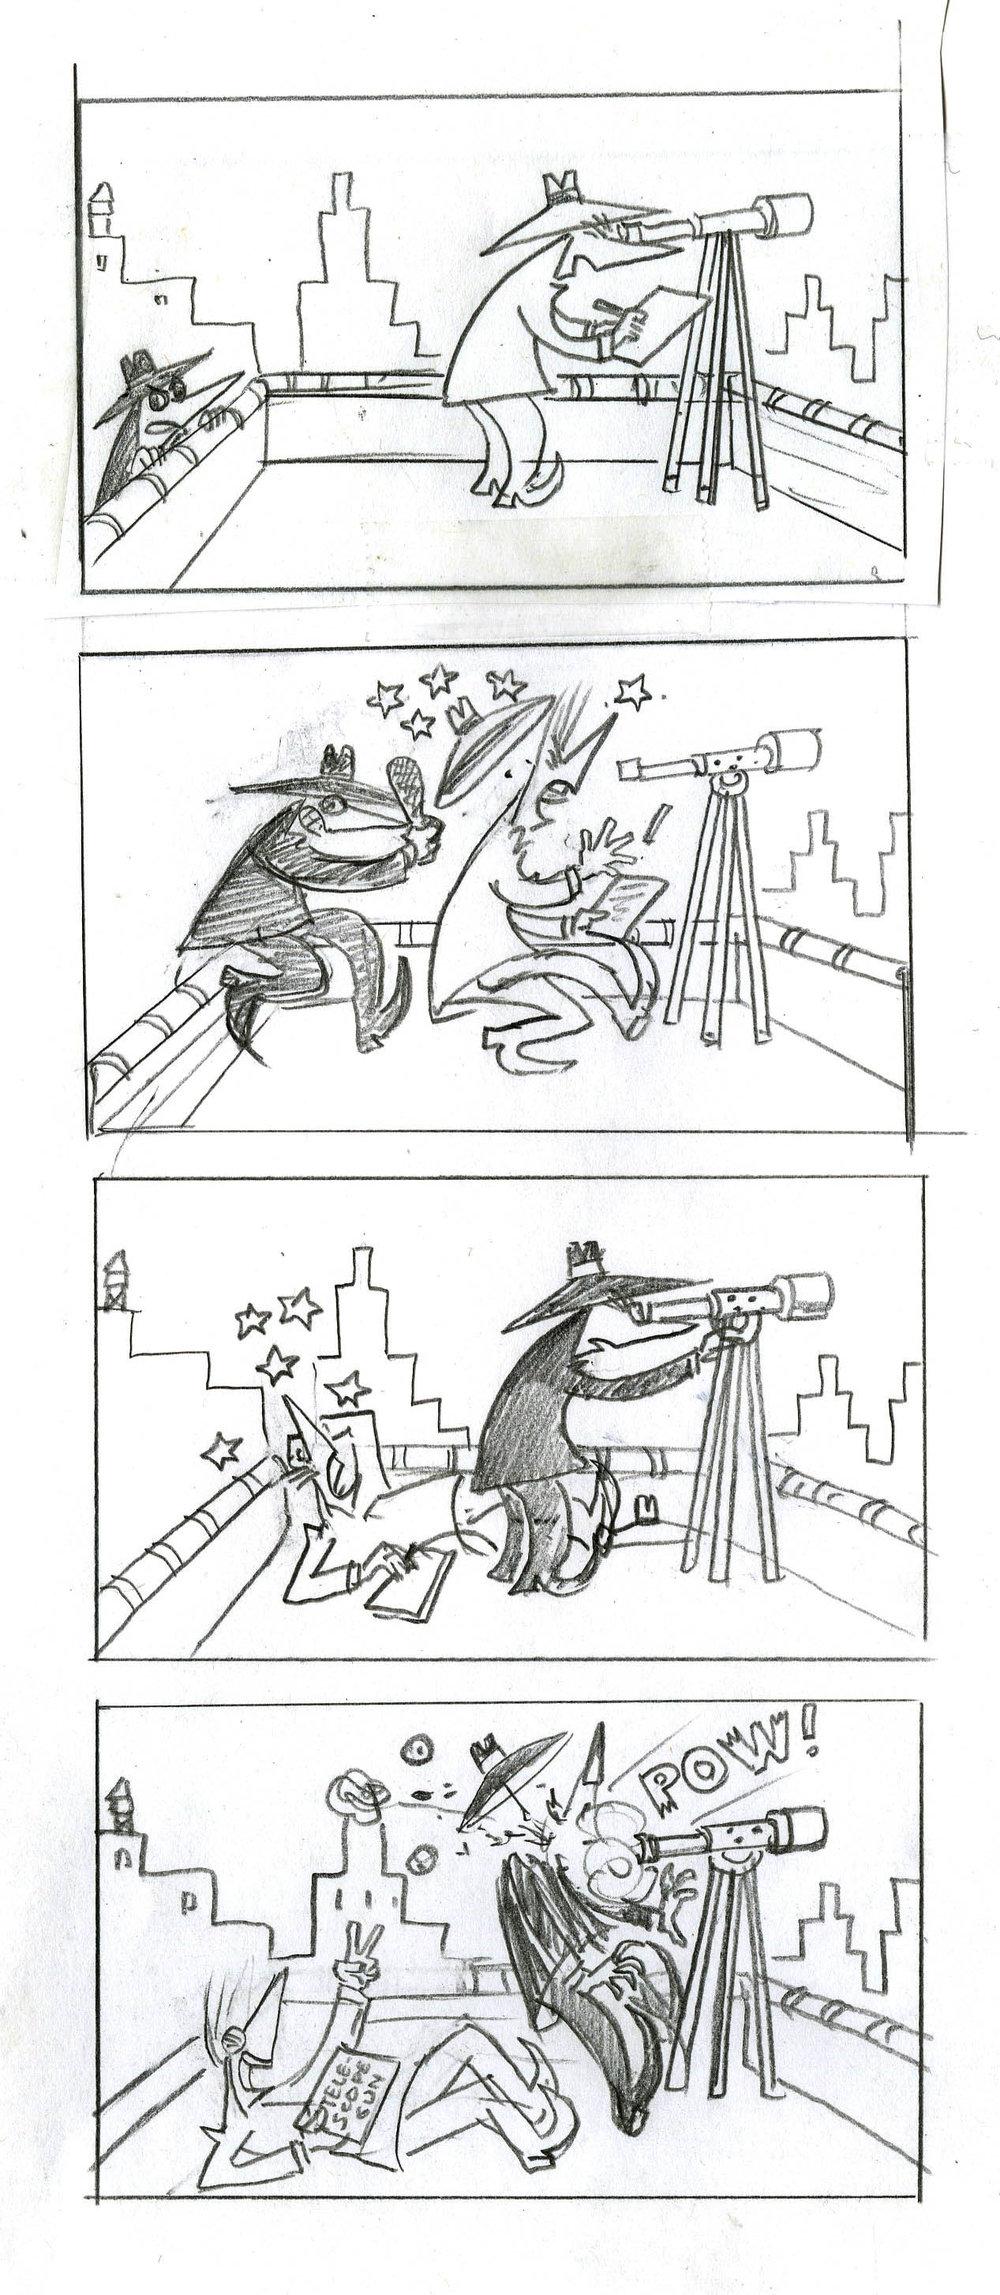 Spy sketch telescope gun